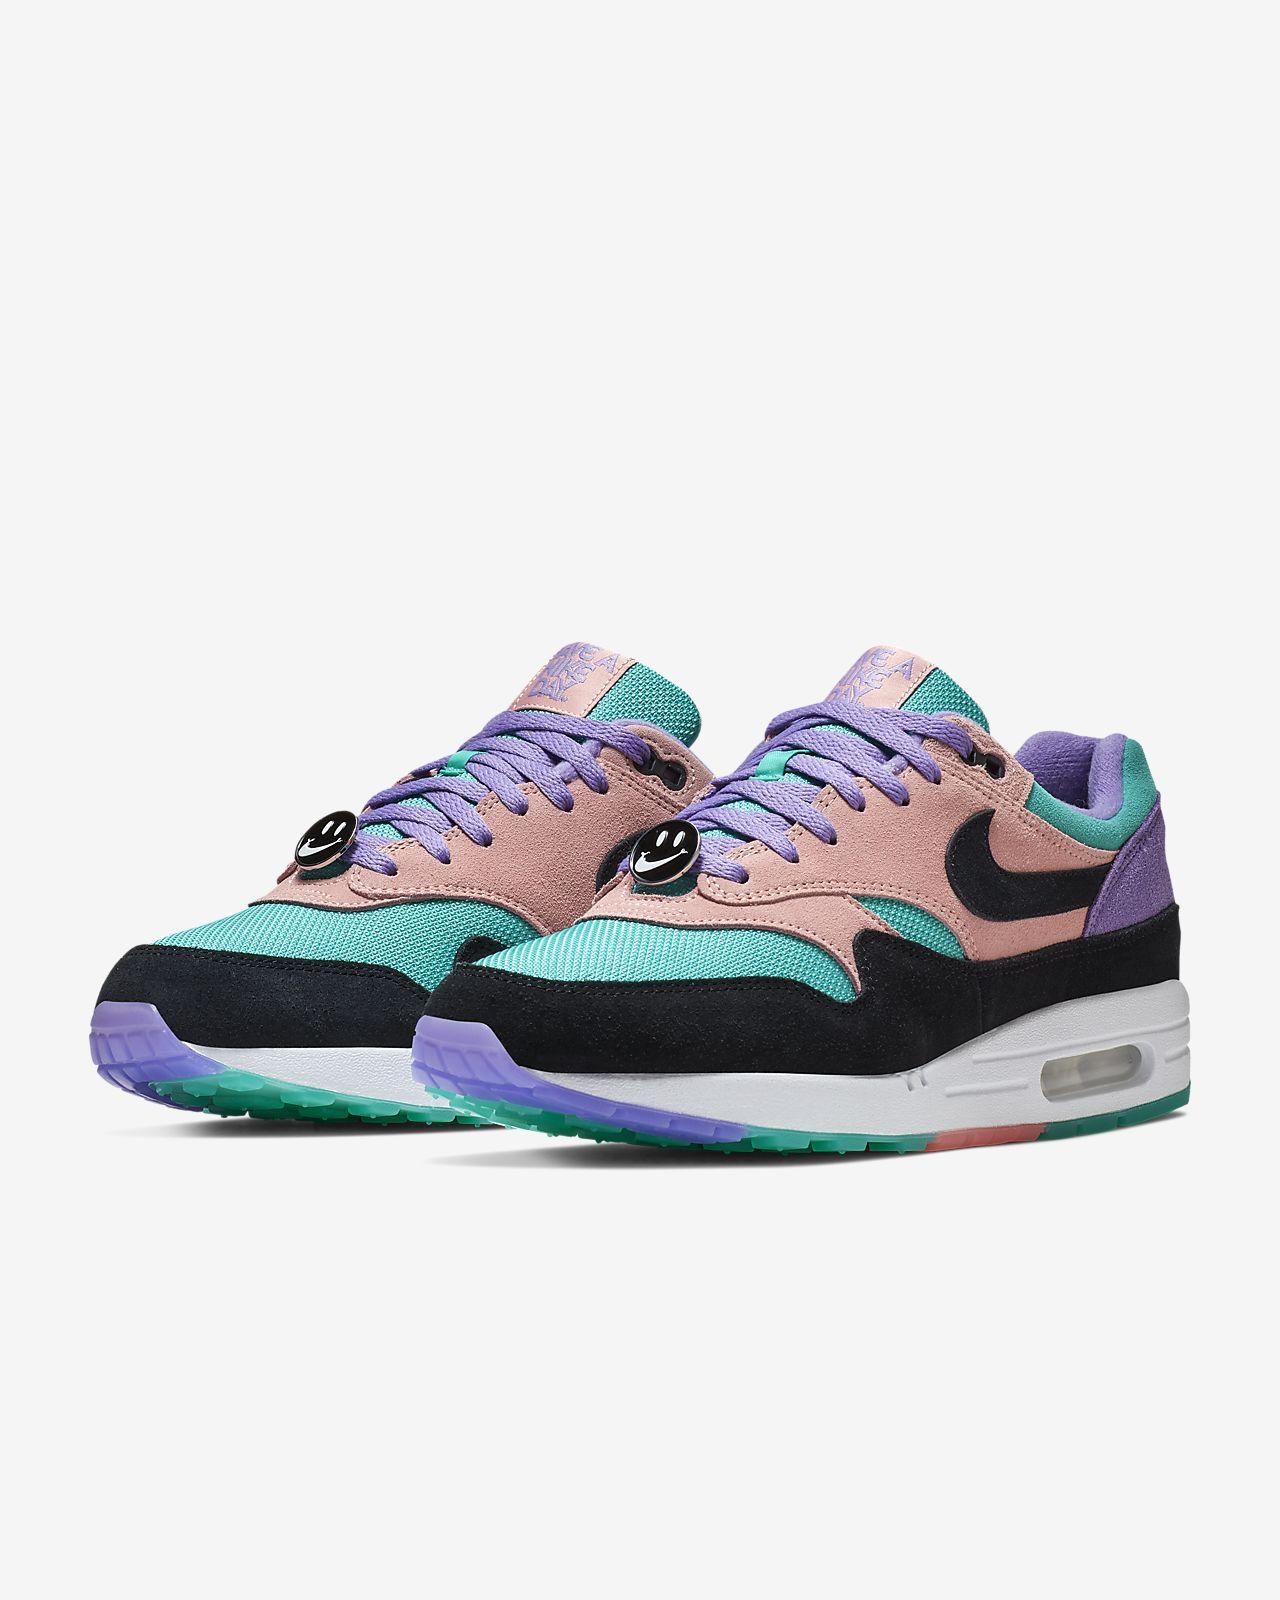 quality design b1852 e351f ... Nike Air Max 1 ND Men s Shoe